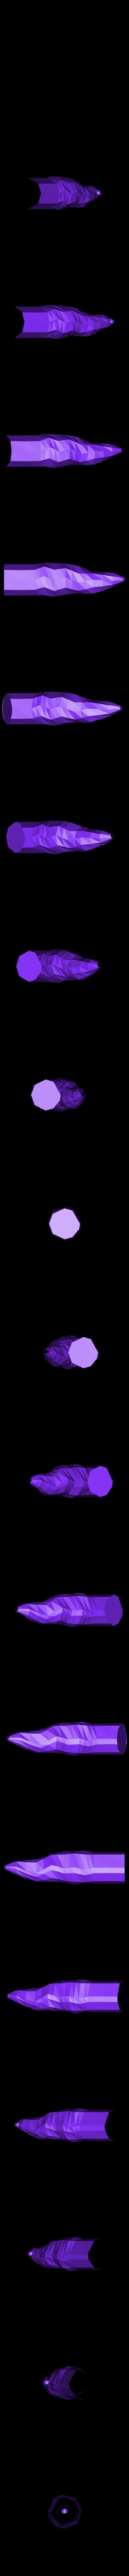 1xorange.stl Download free STL file Snowman • Object to 3D print, Raeunn3D